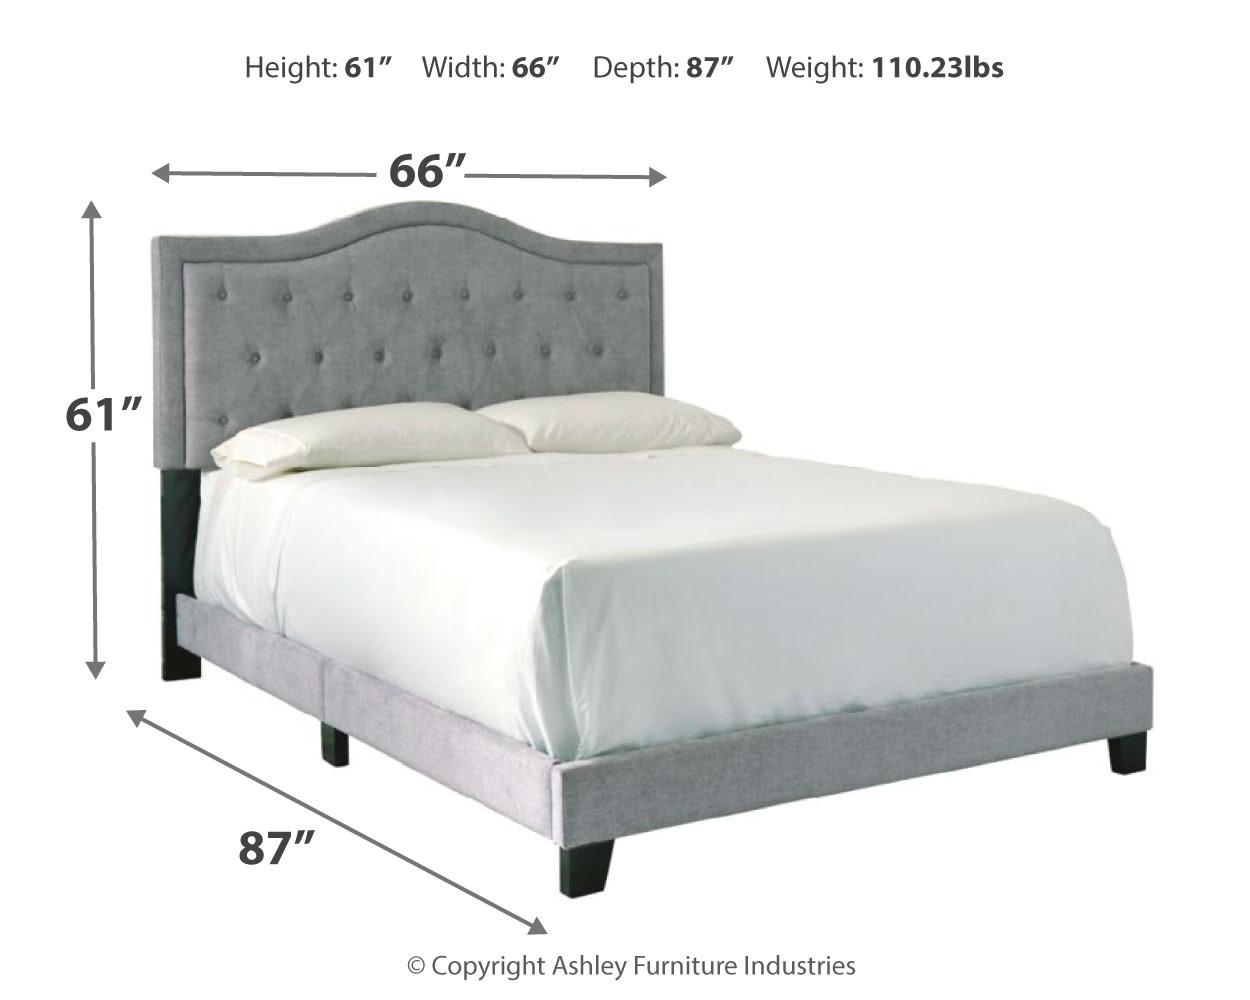 Benchcraft QUEEN- Gray Upholstered Bedframe- Jerary- B090-381